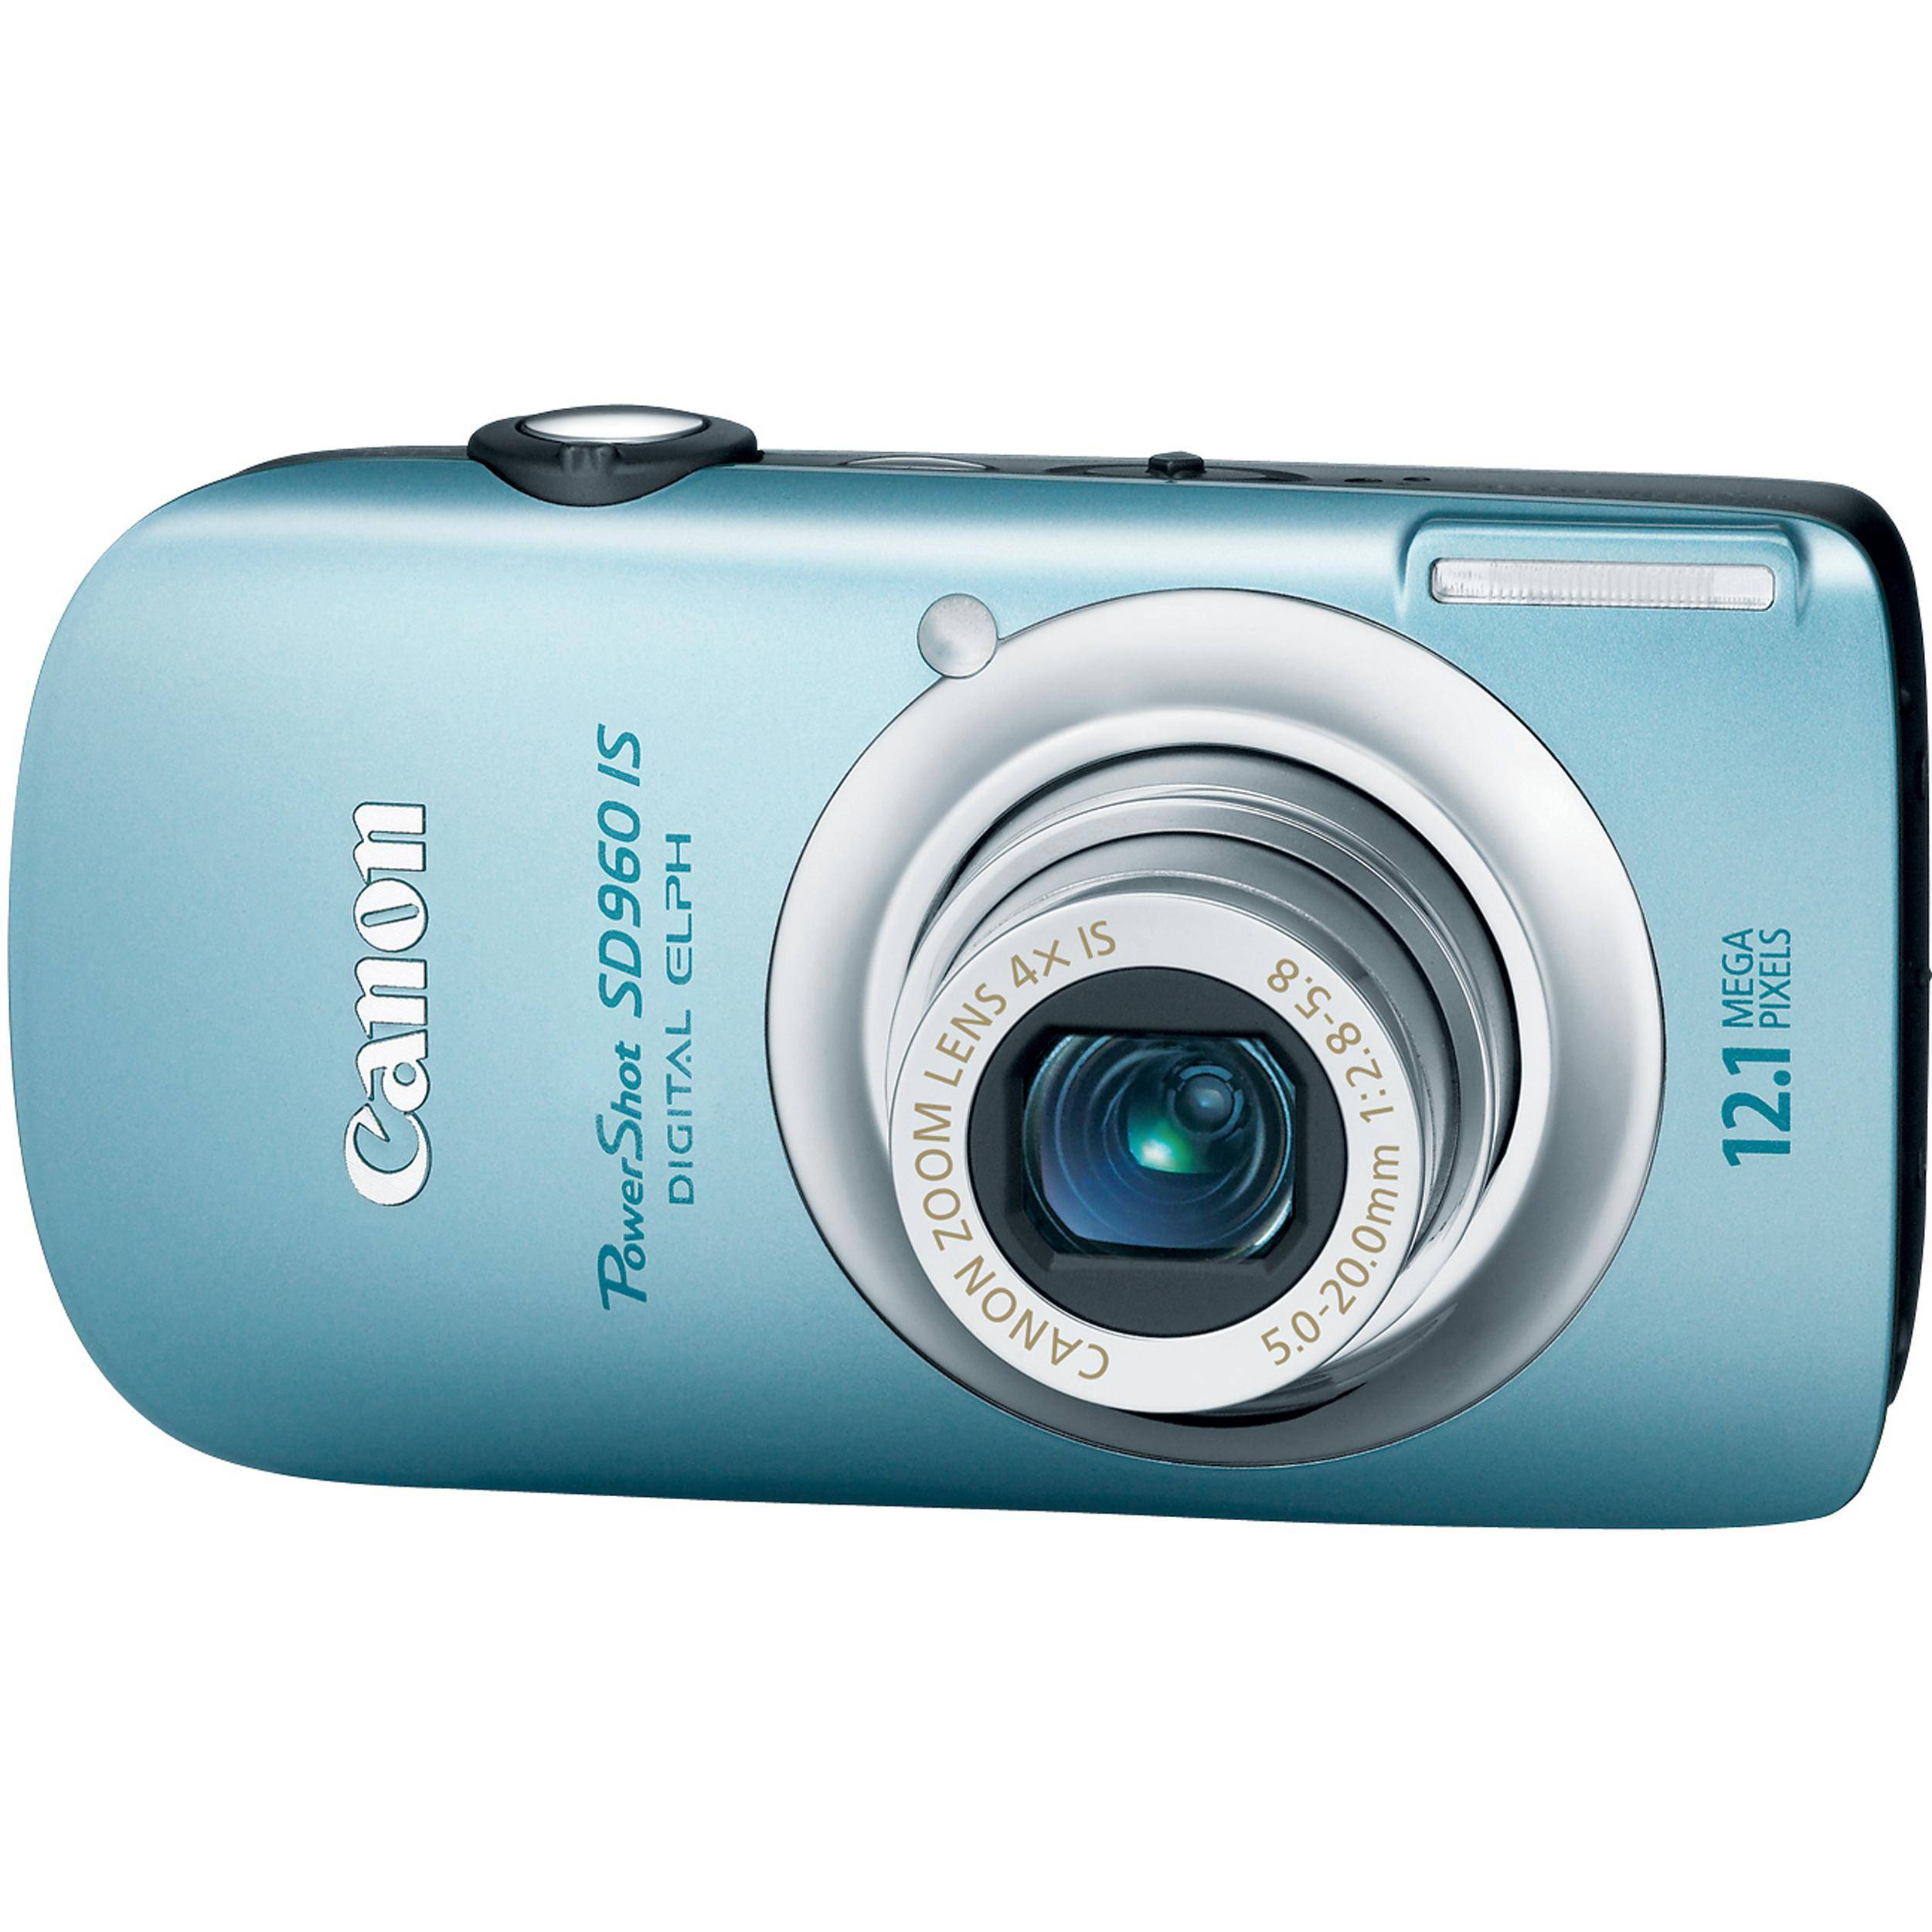 Canon PowerShot SD960 IS Digital Camera (Blue) 3578B001 B&H